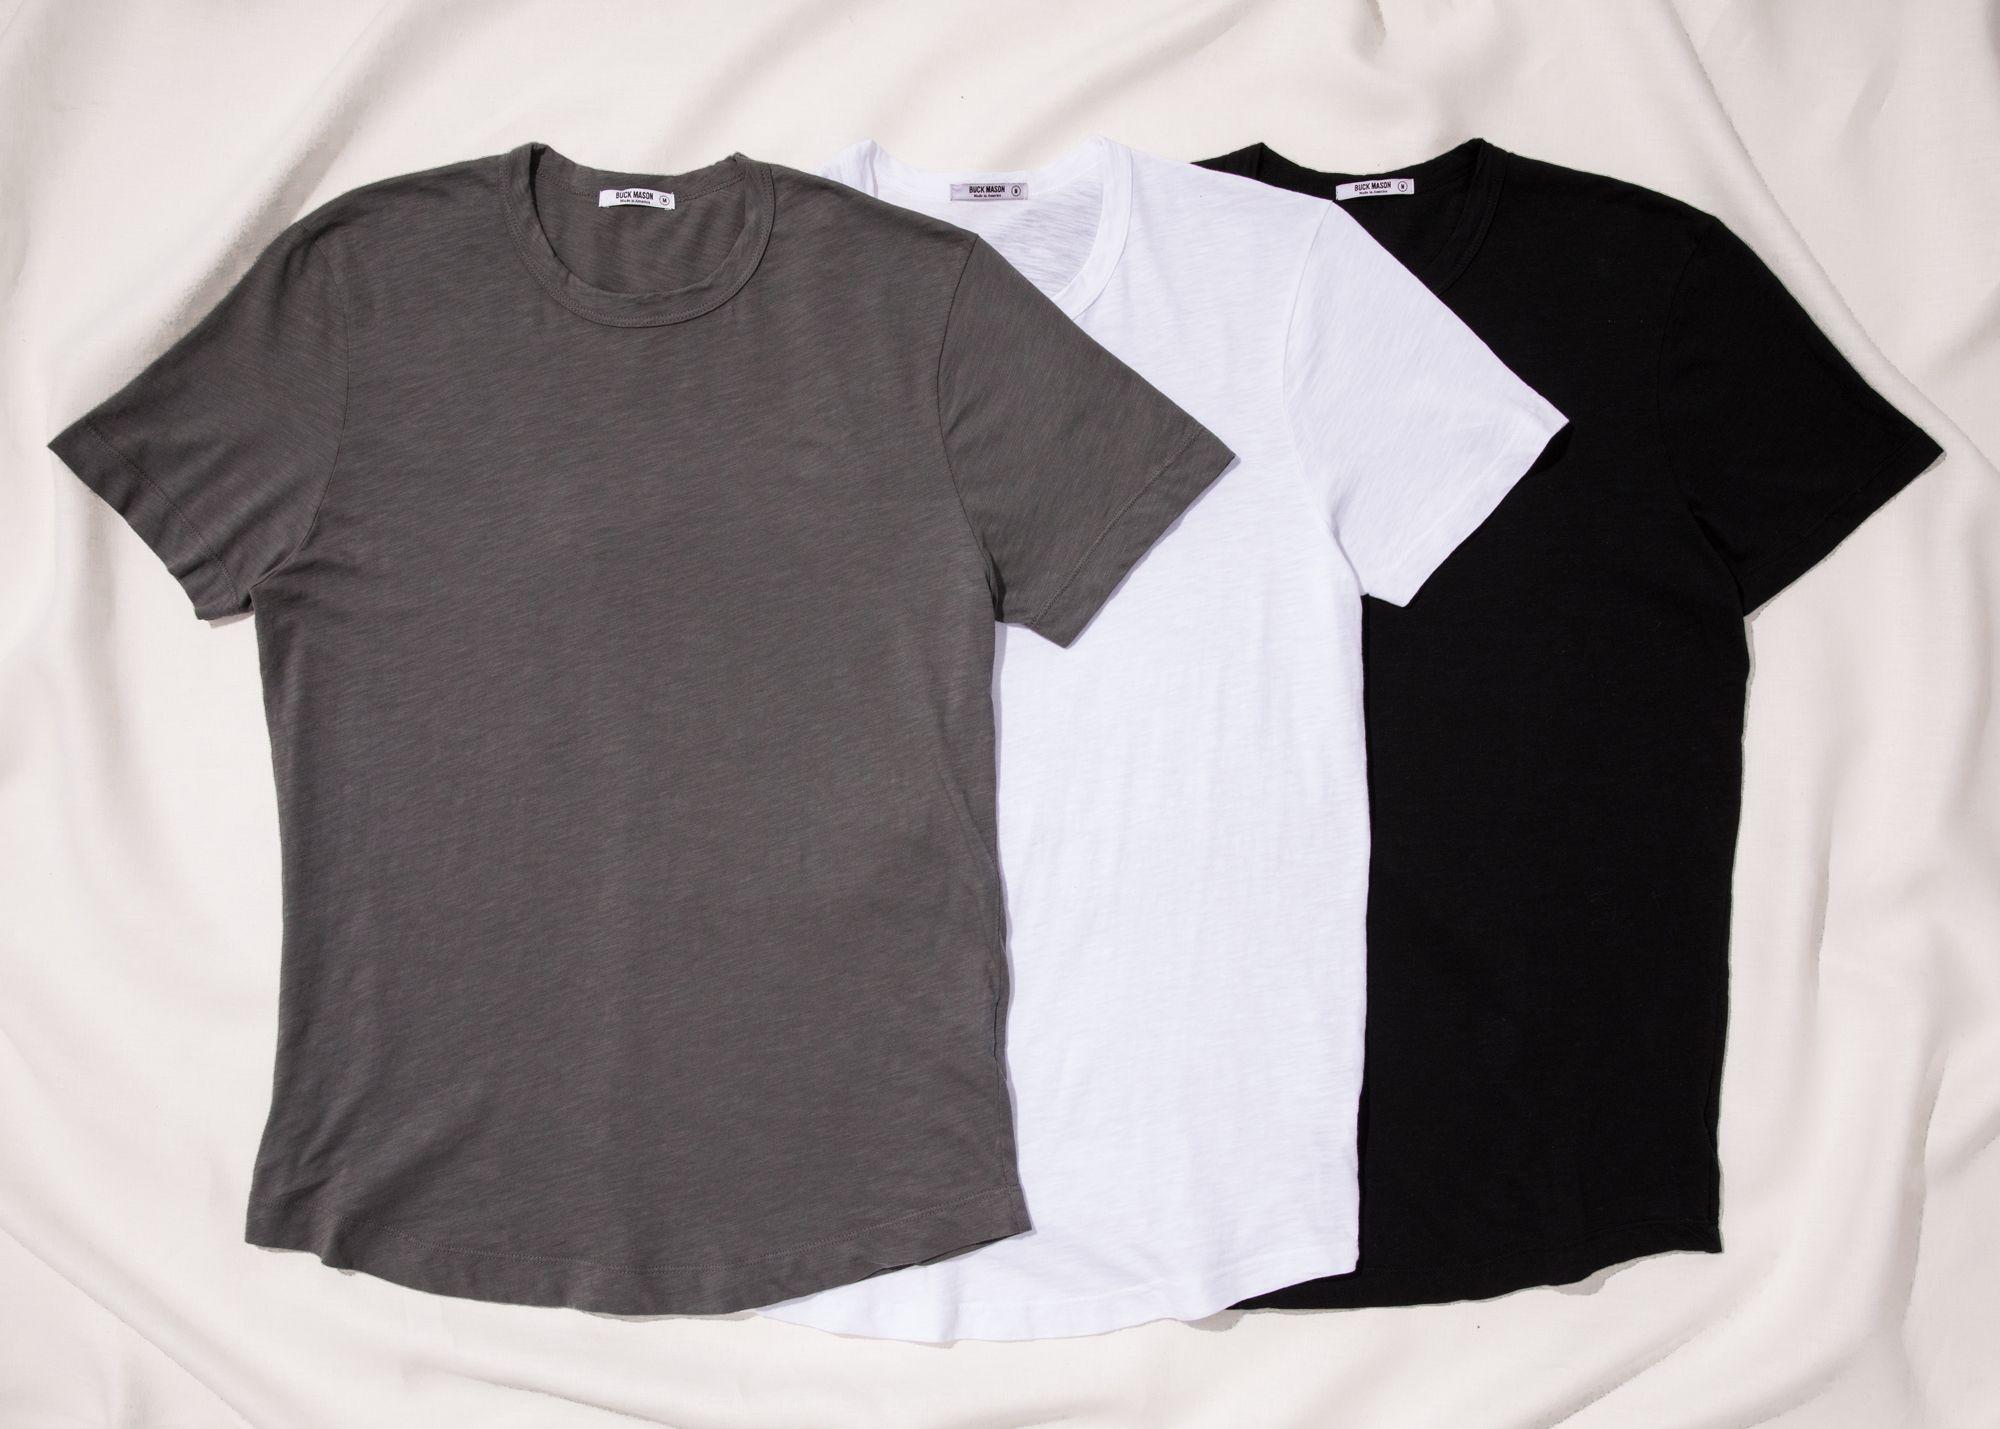 fa4c27aa Buck Mason Curved Hem Slub T-Shirt - The Elevated, Made-in-America T ...